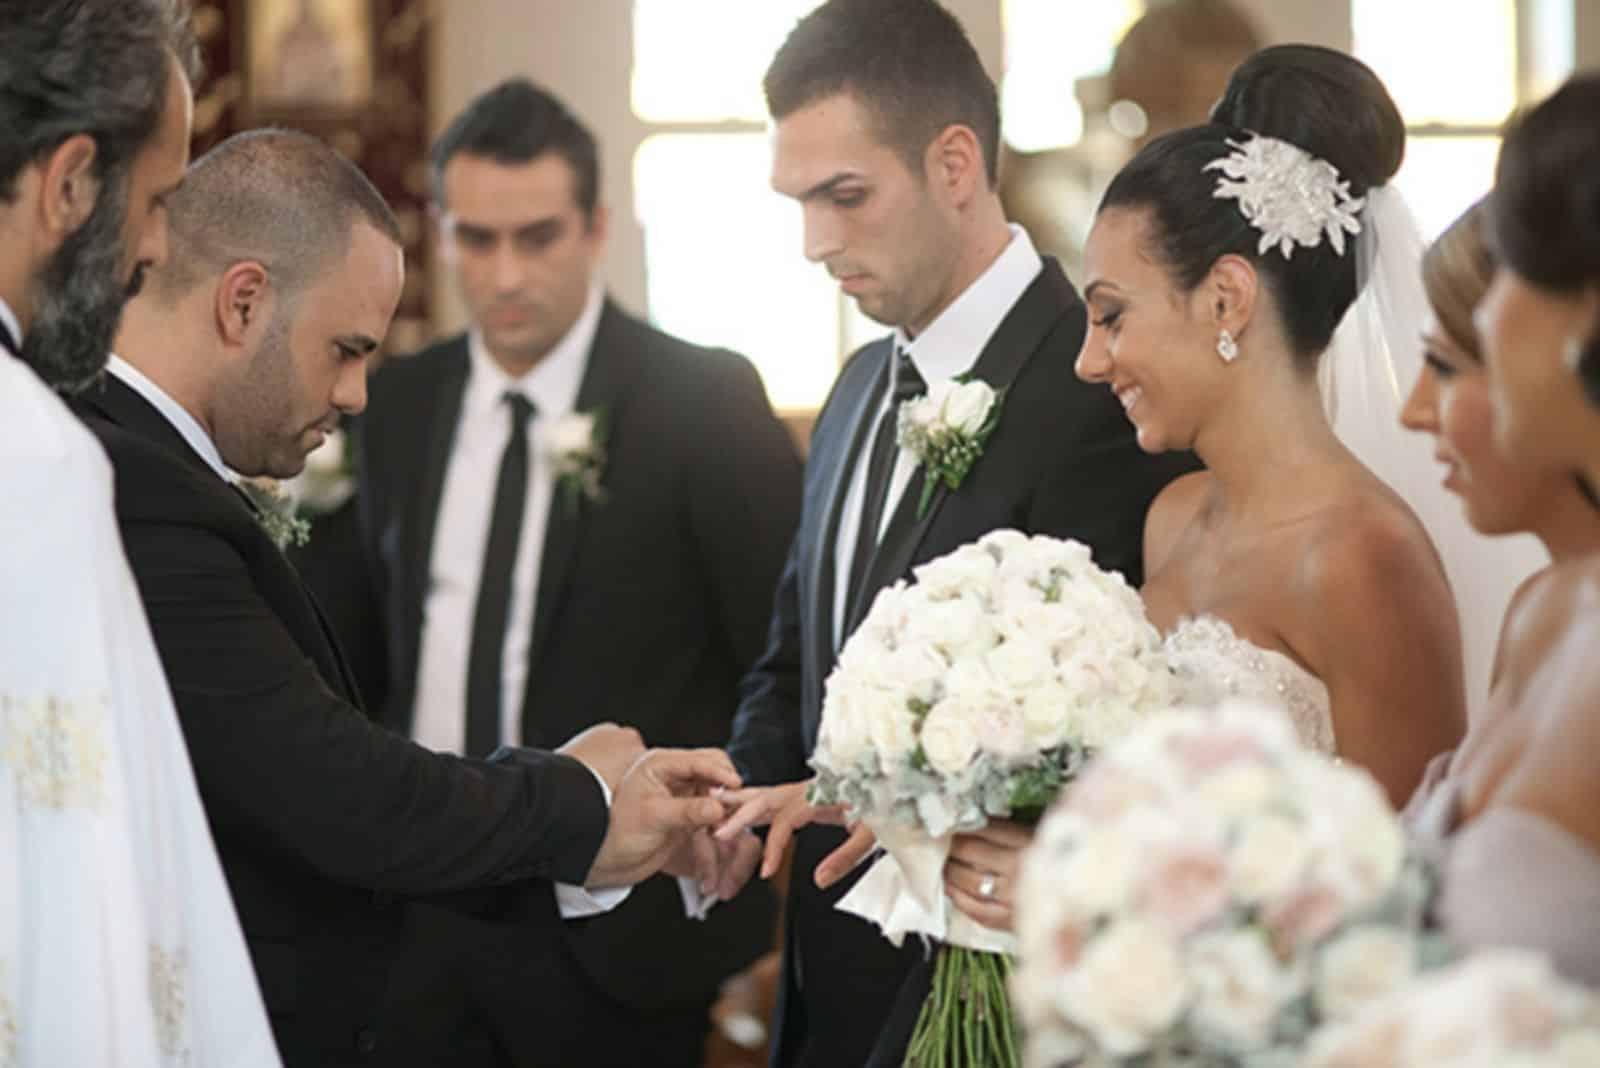 Trauzeuge gibt Jungvermählten Eheringe